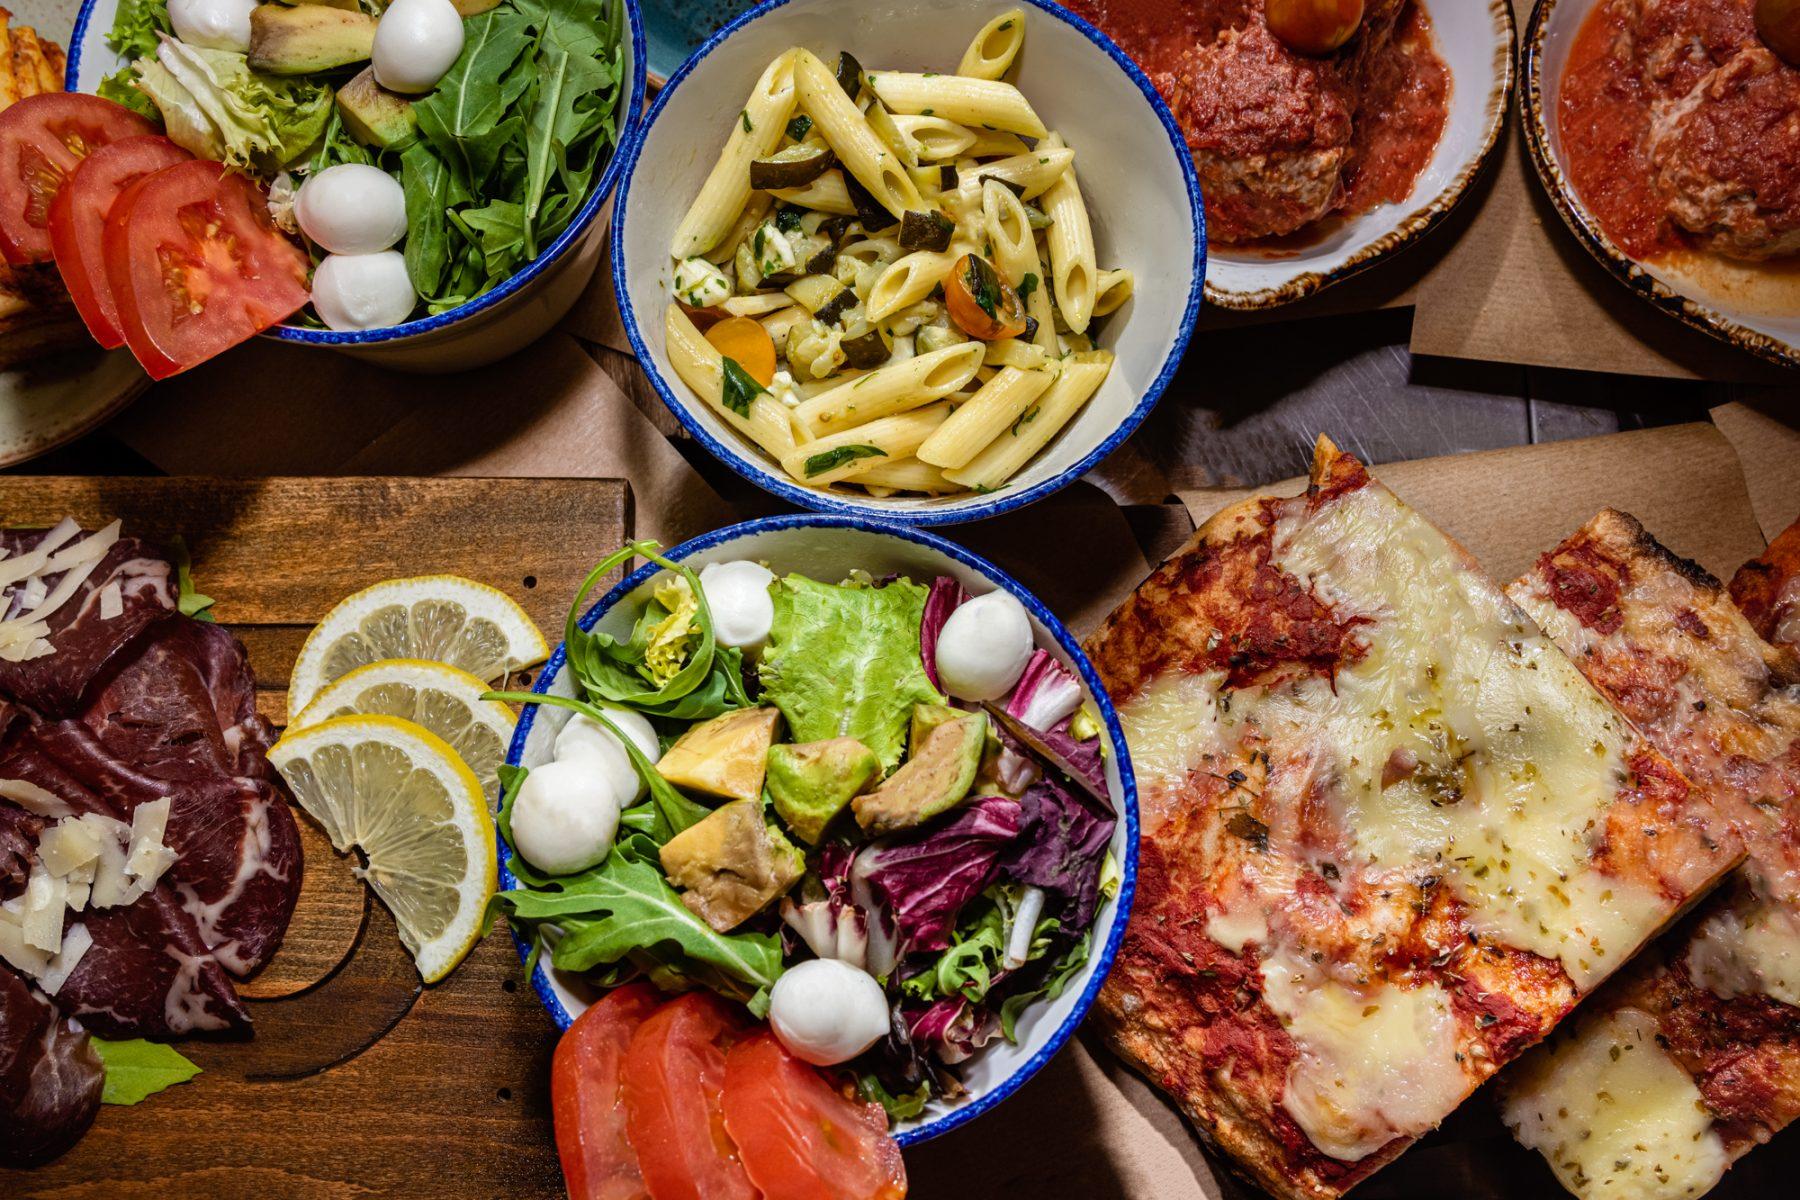 cinc food parlour food display pasta lasagne pizza salad